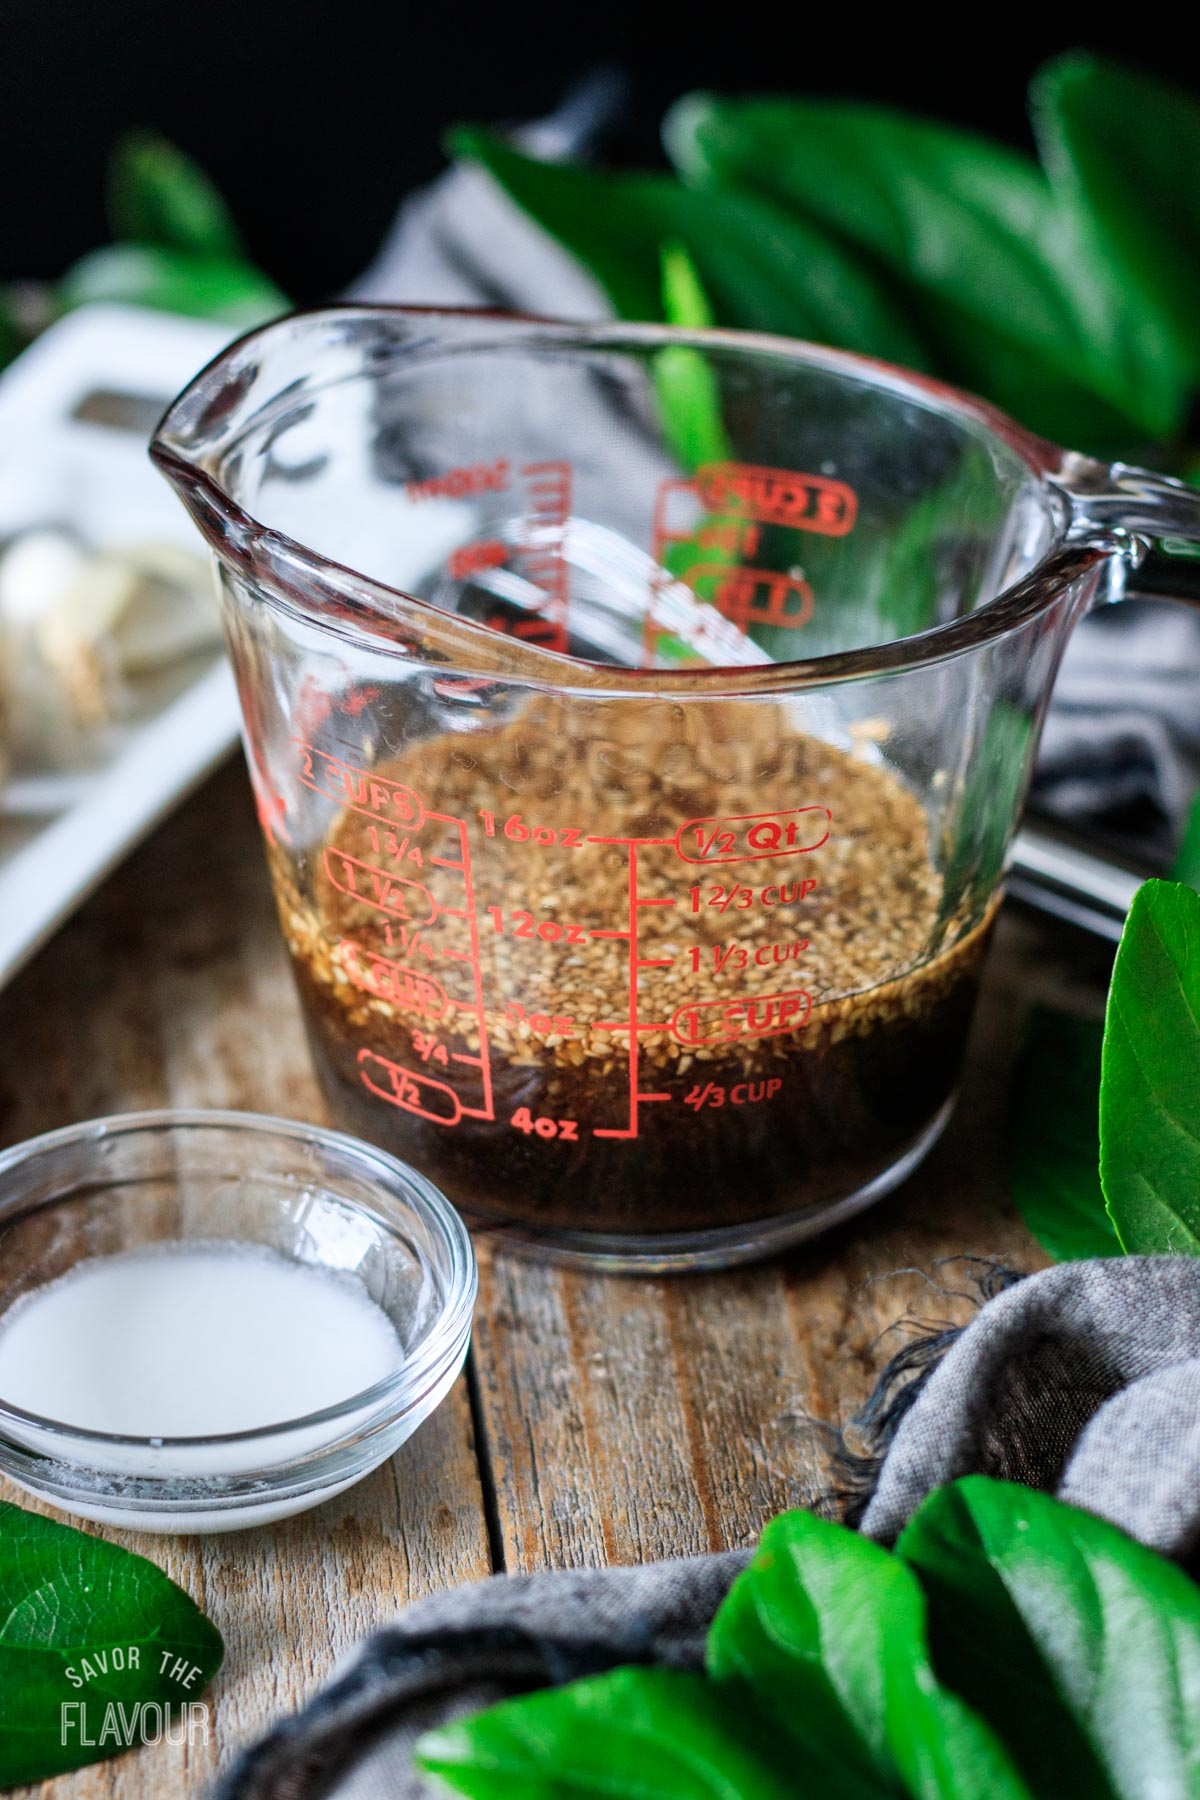 glass measuring cup filled with vegan stir fry sauce